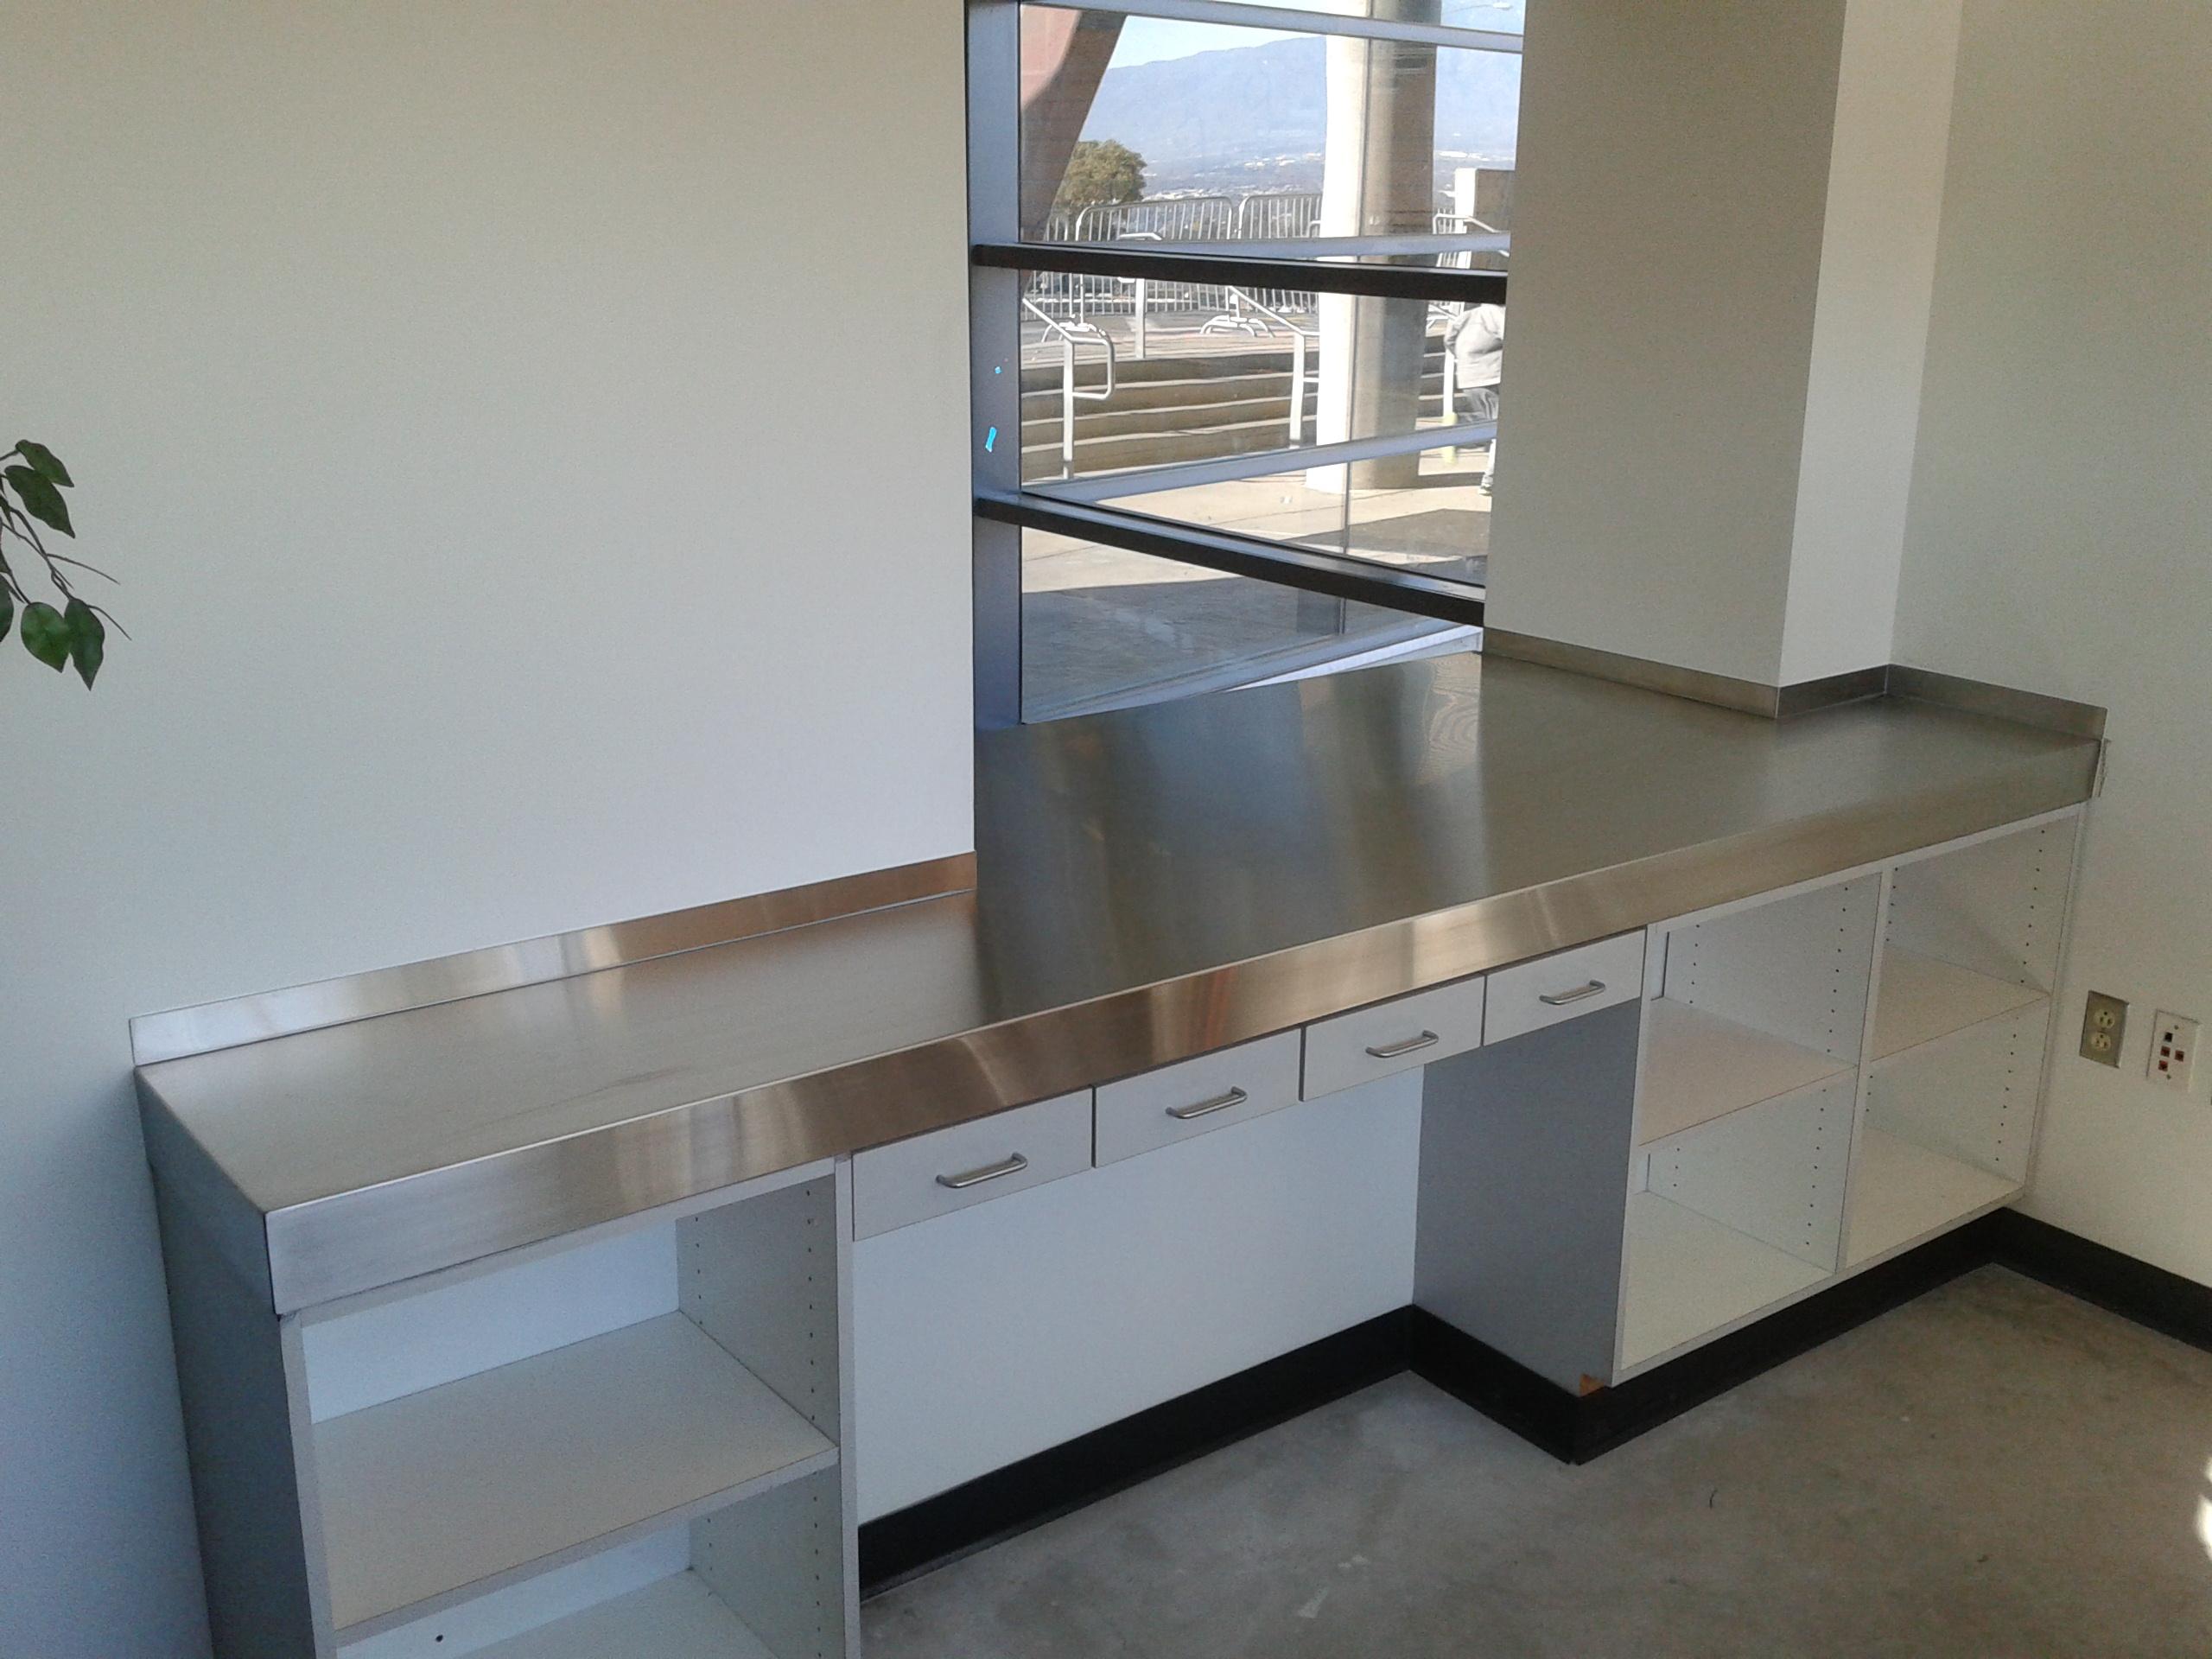 Stainless Steel Countertop pass thru